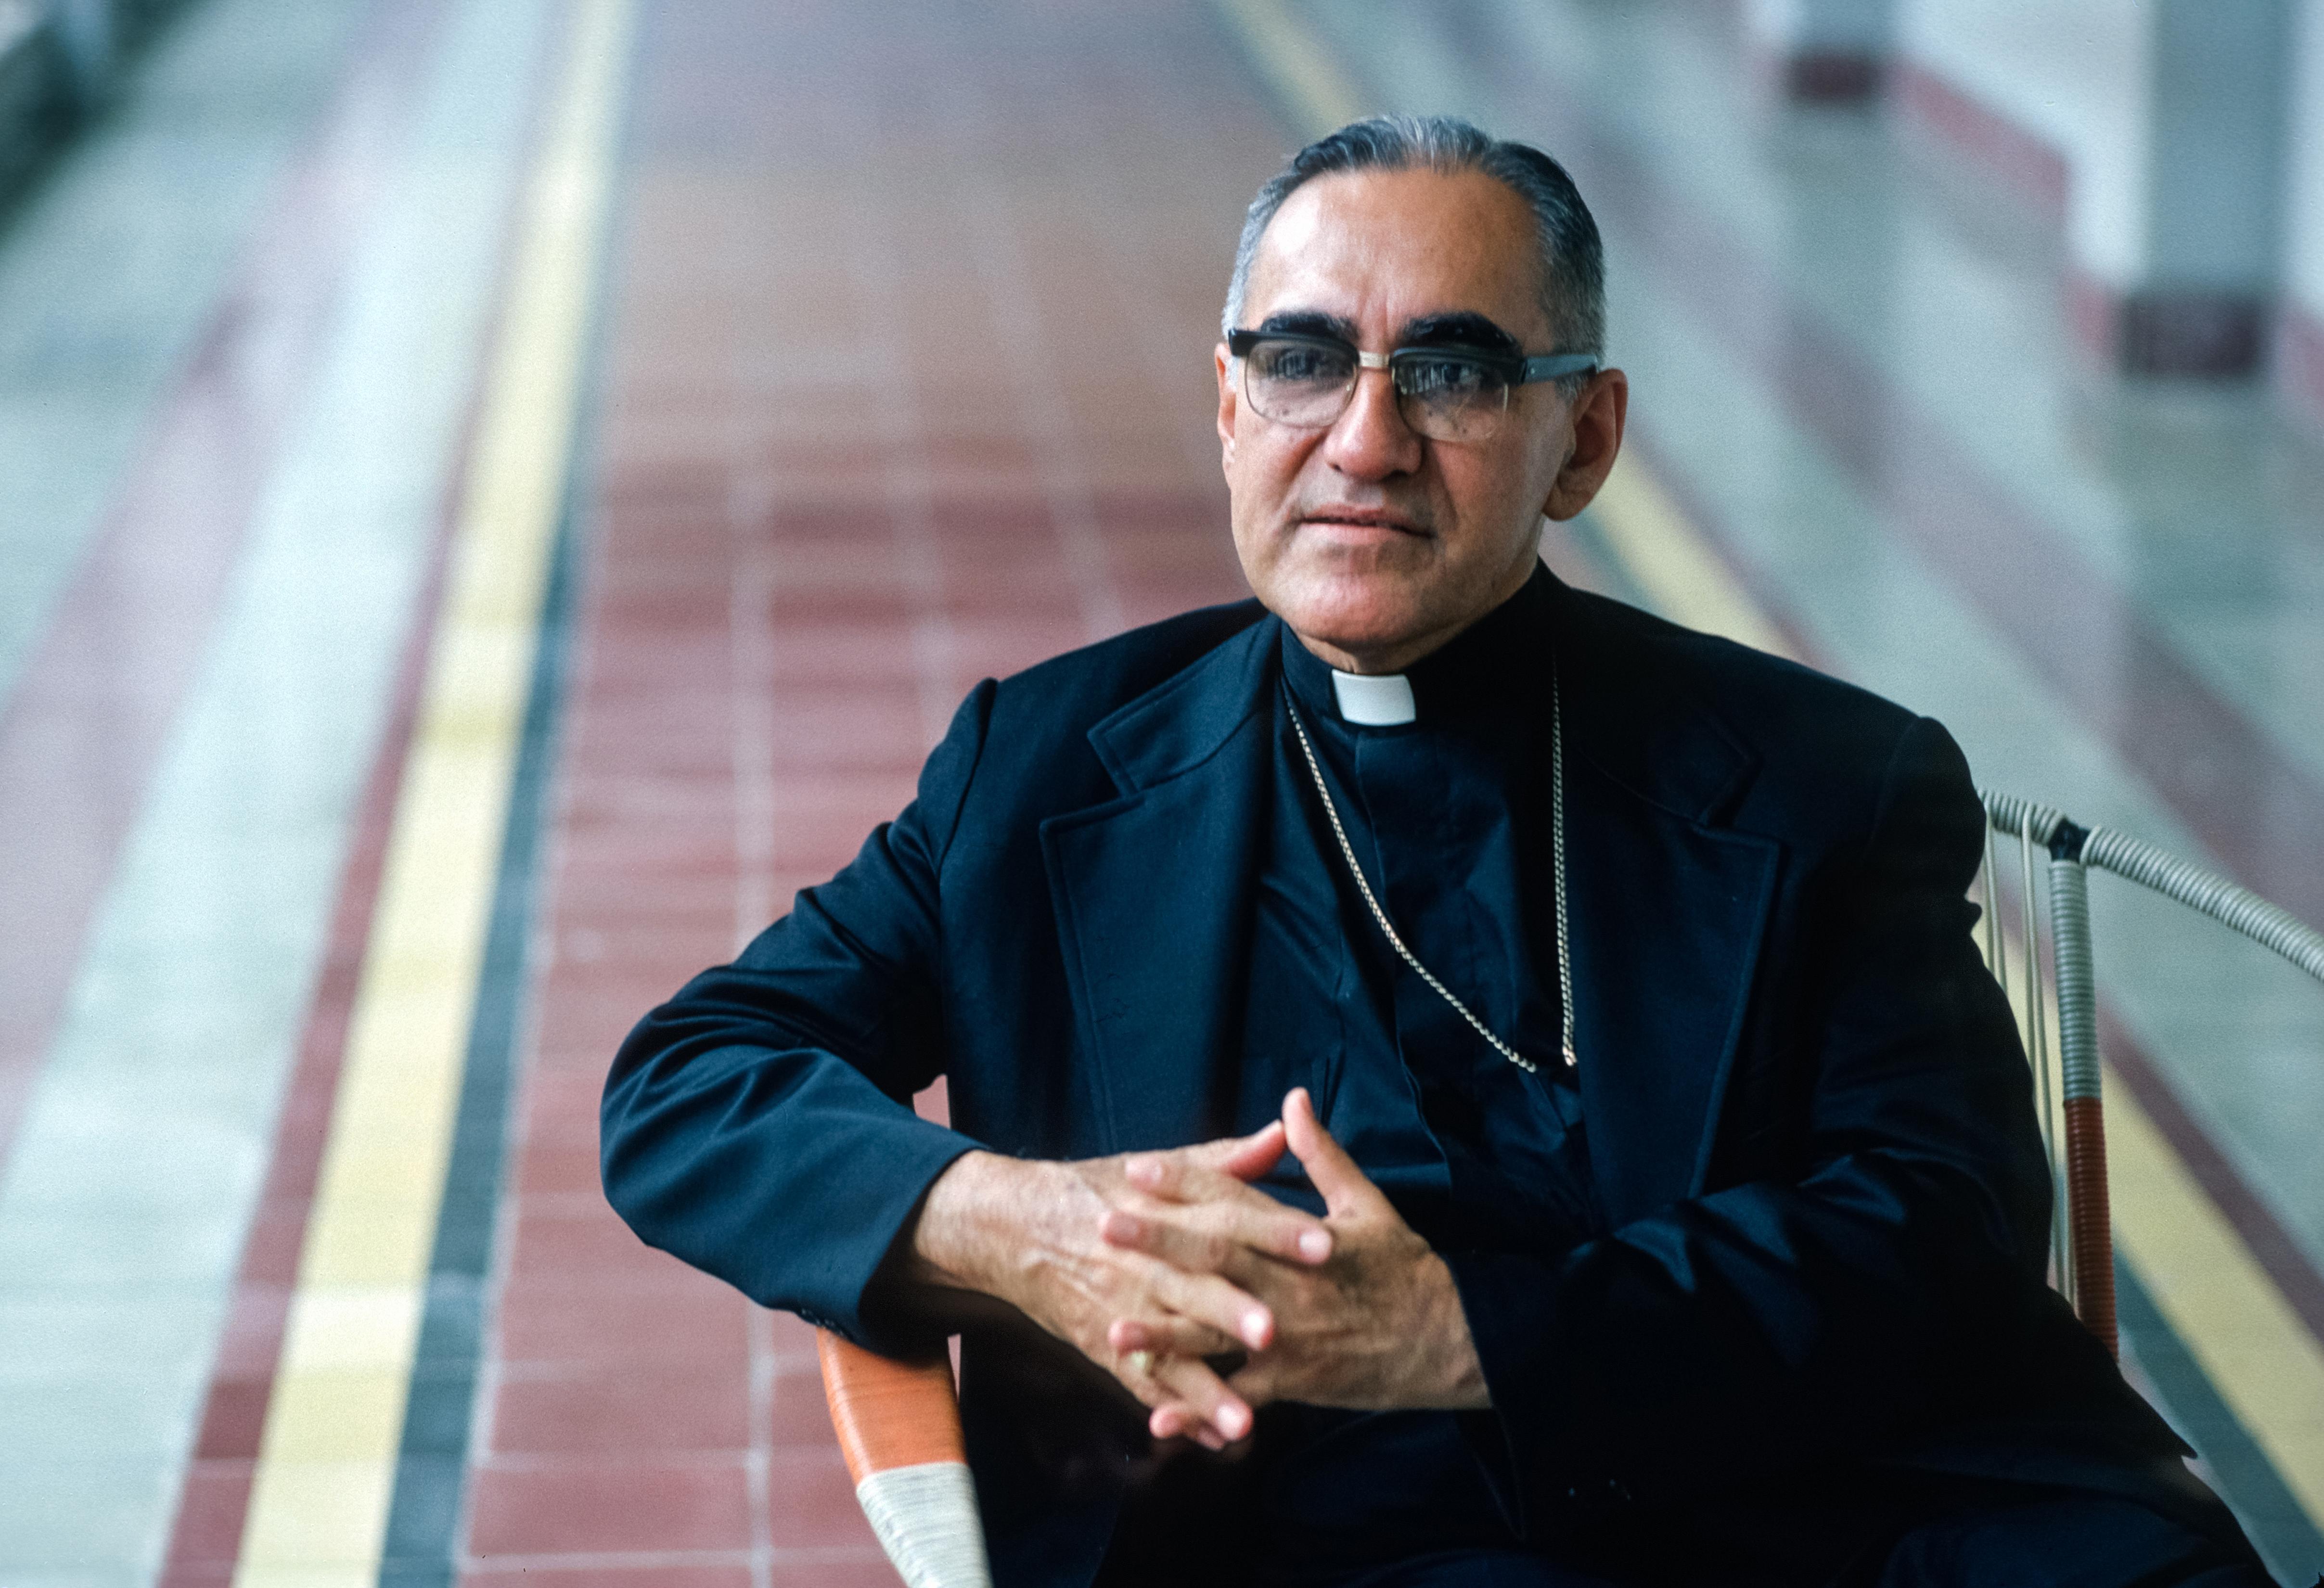 Arzobispo Oscar Romero